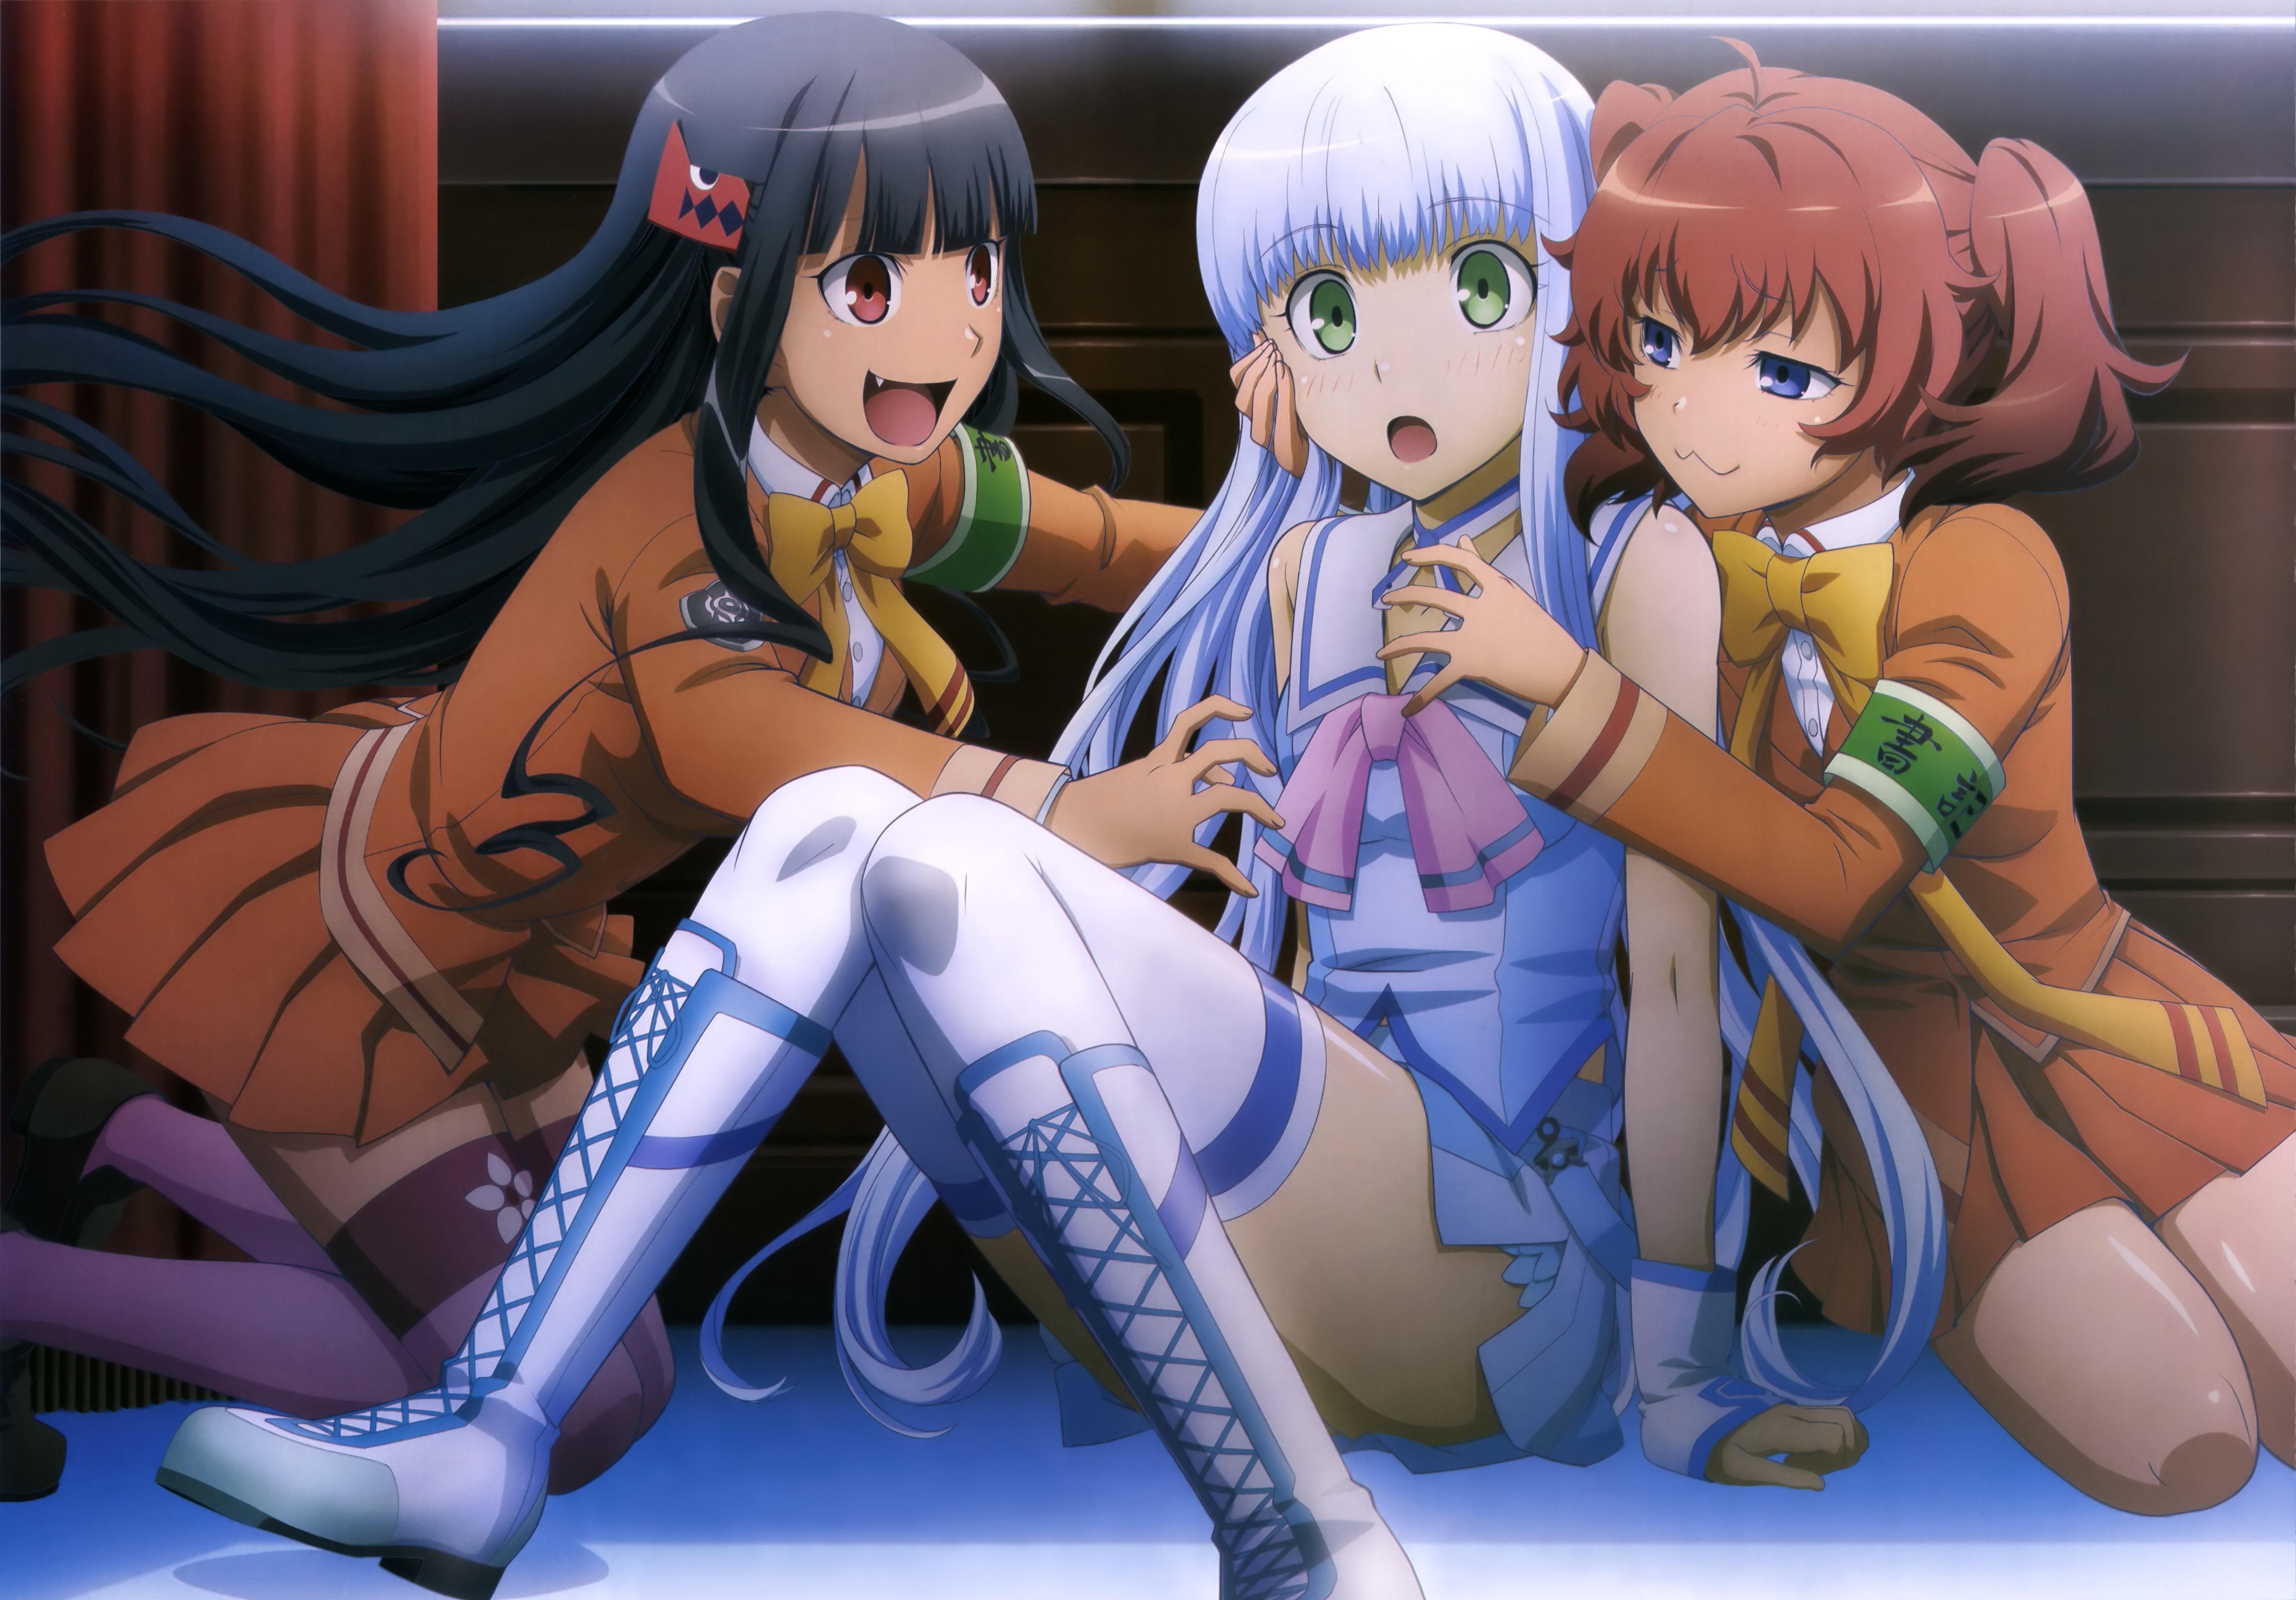 NyanType-Magazine-October-anime-posters-aoki hagane no arpeggio